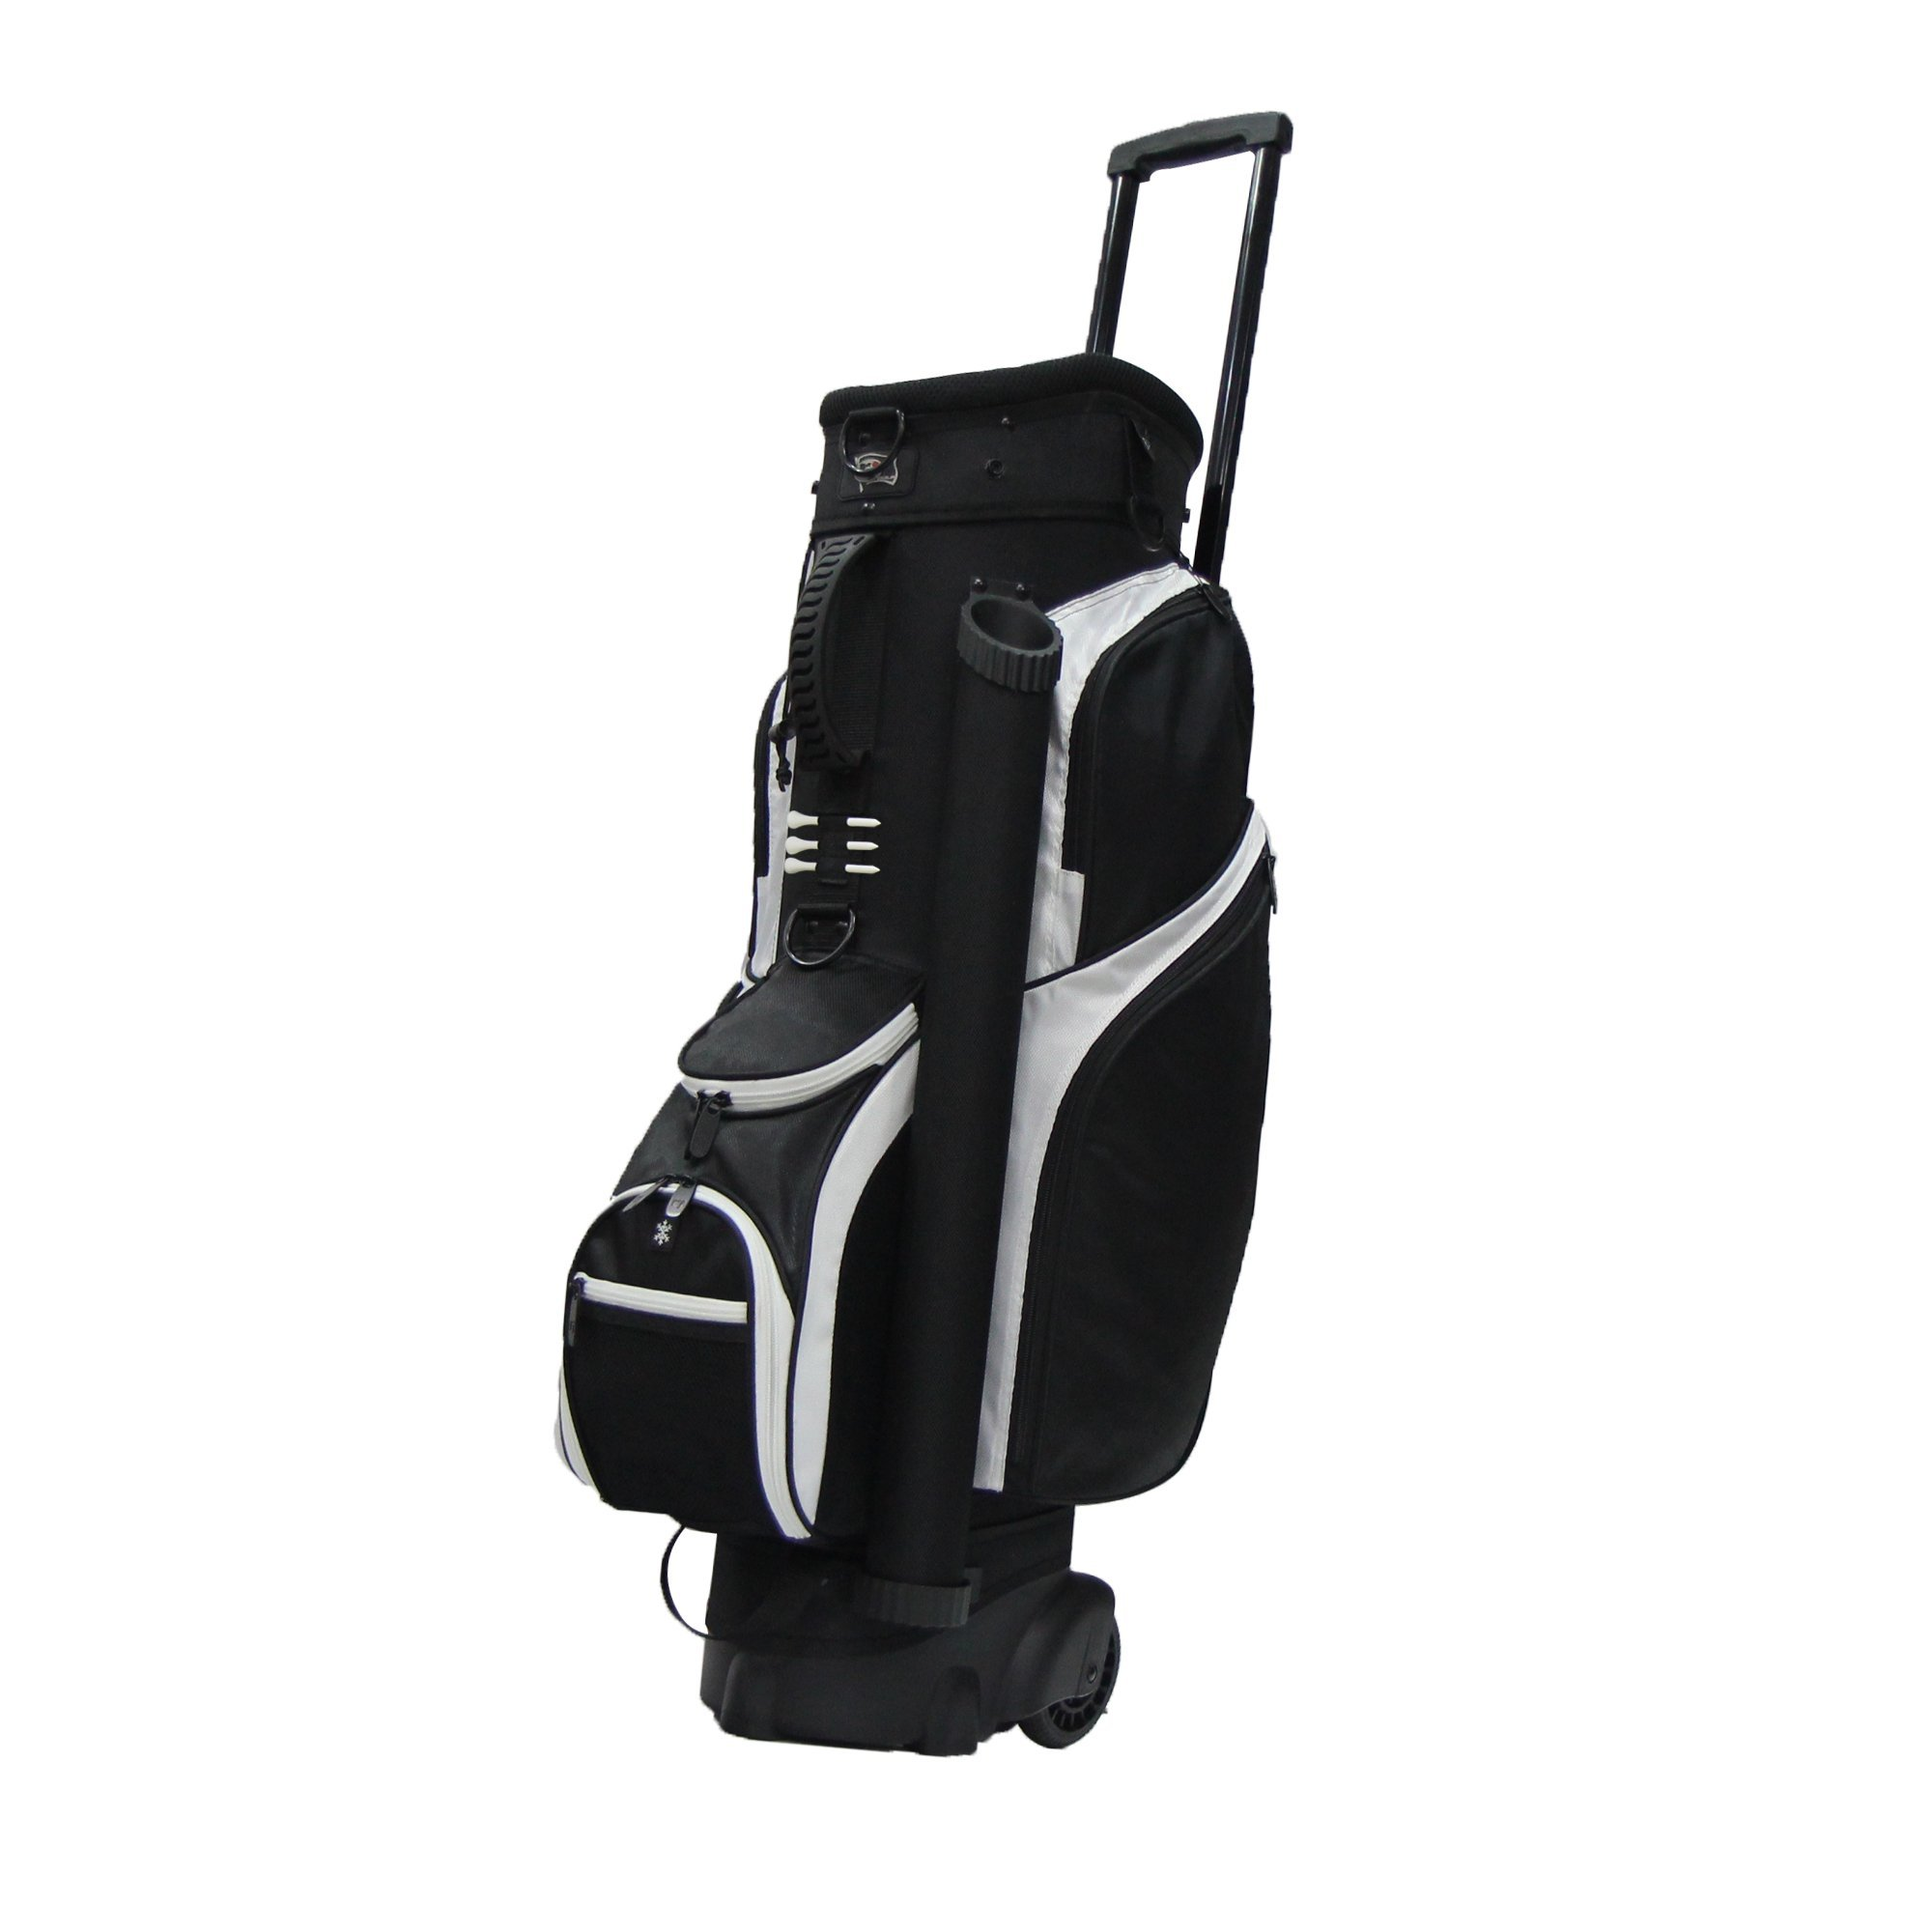 RJ Sports Spinner Transport Bag, 9.5'', Black/Black